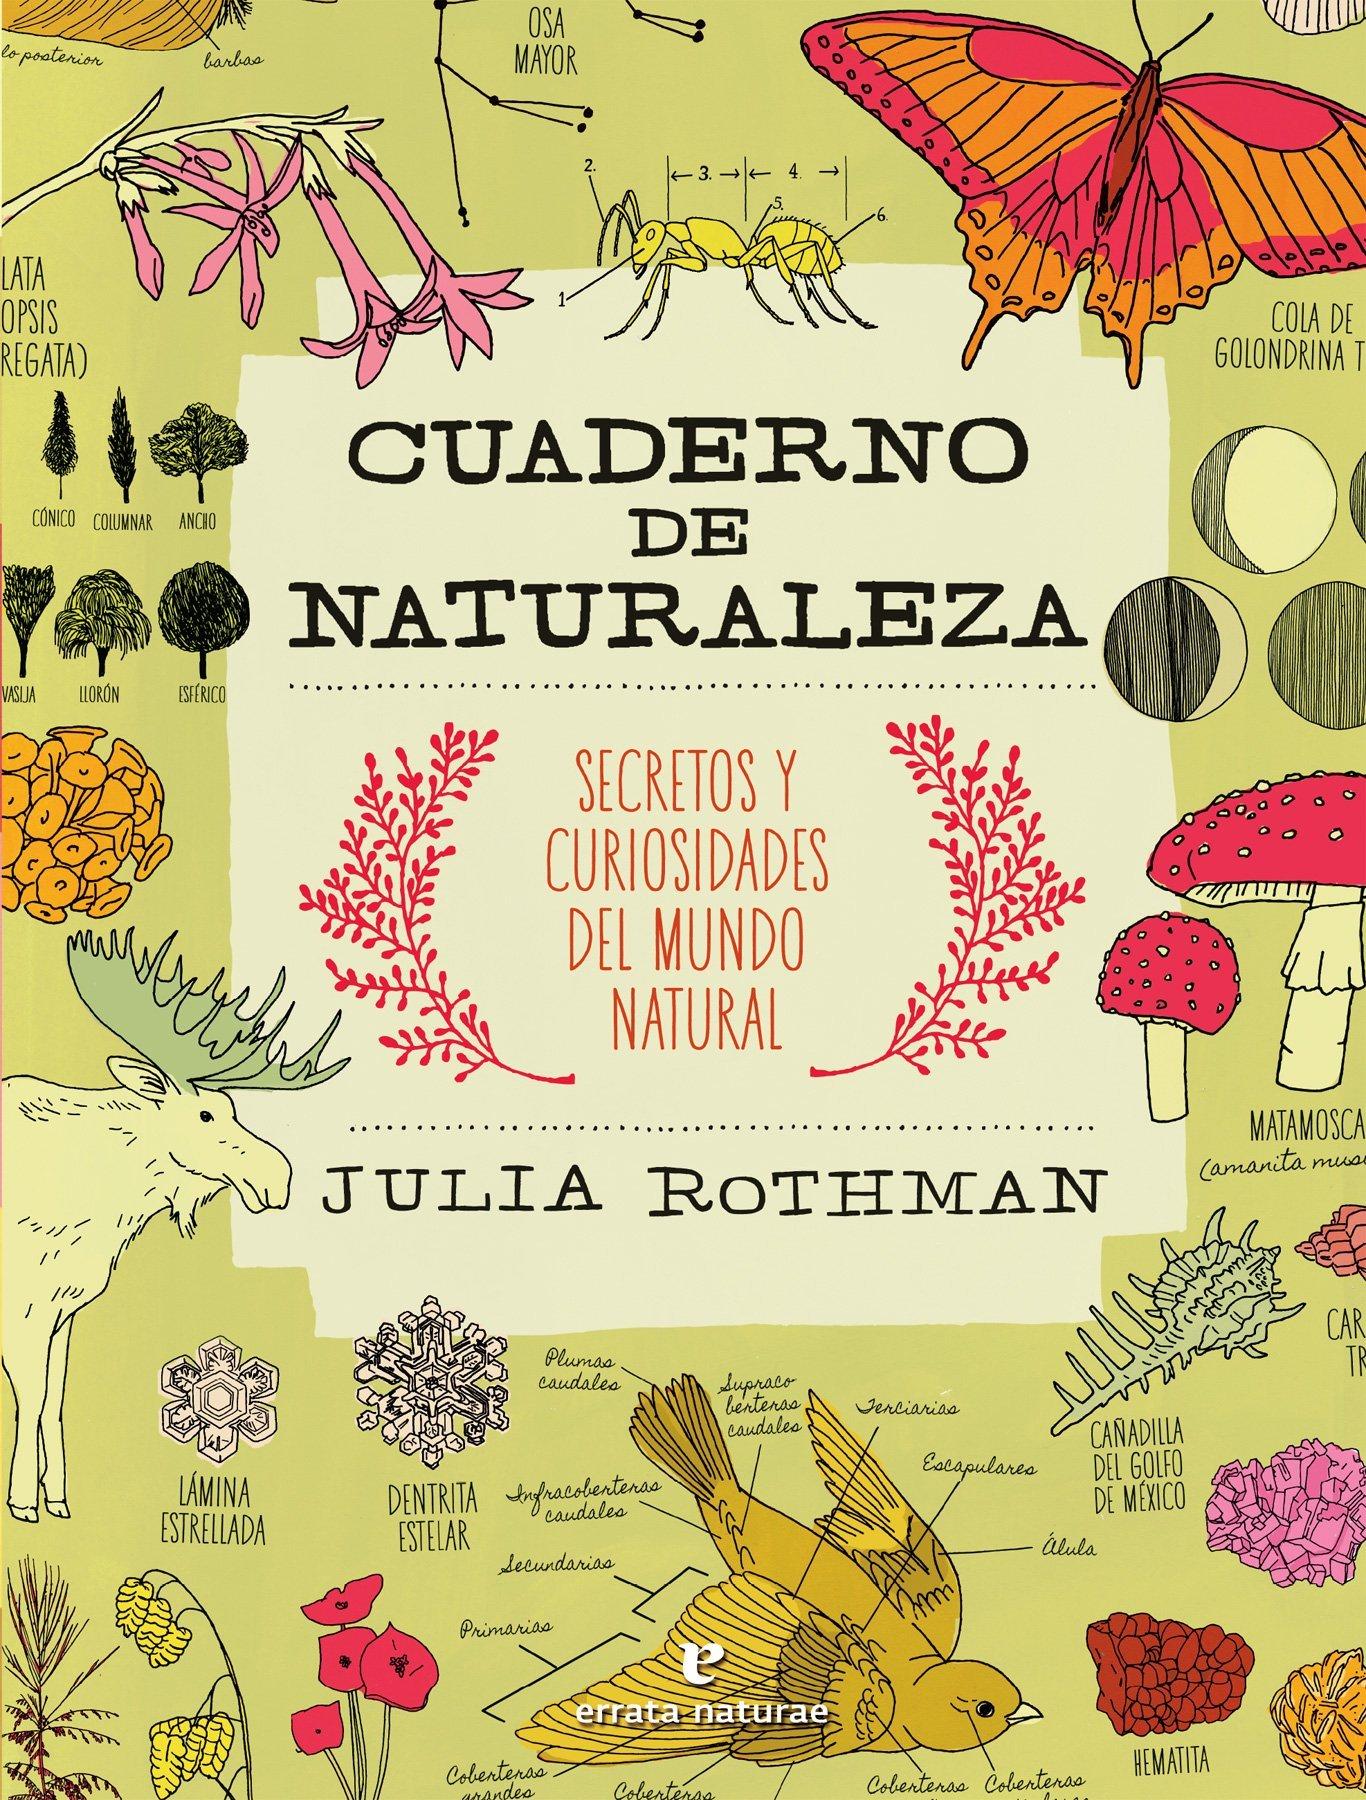 Cuaderno-de-naturaleza_portada_DEF